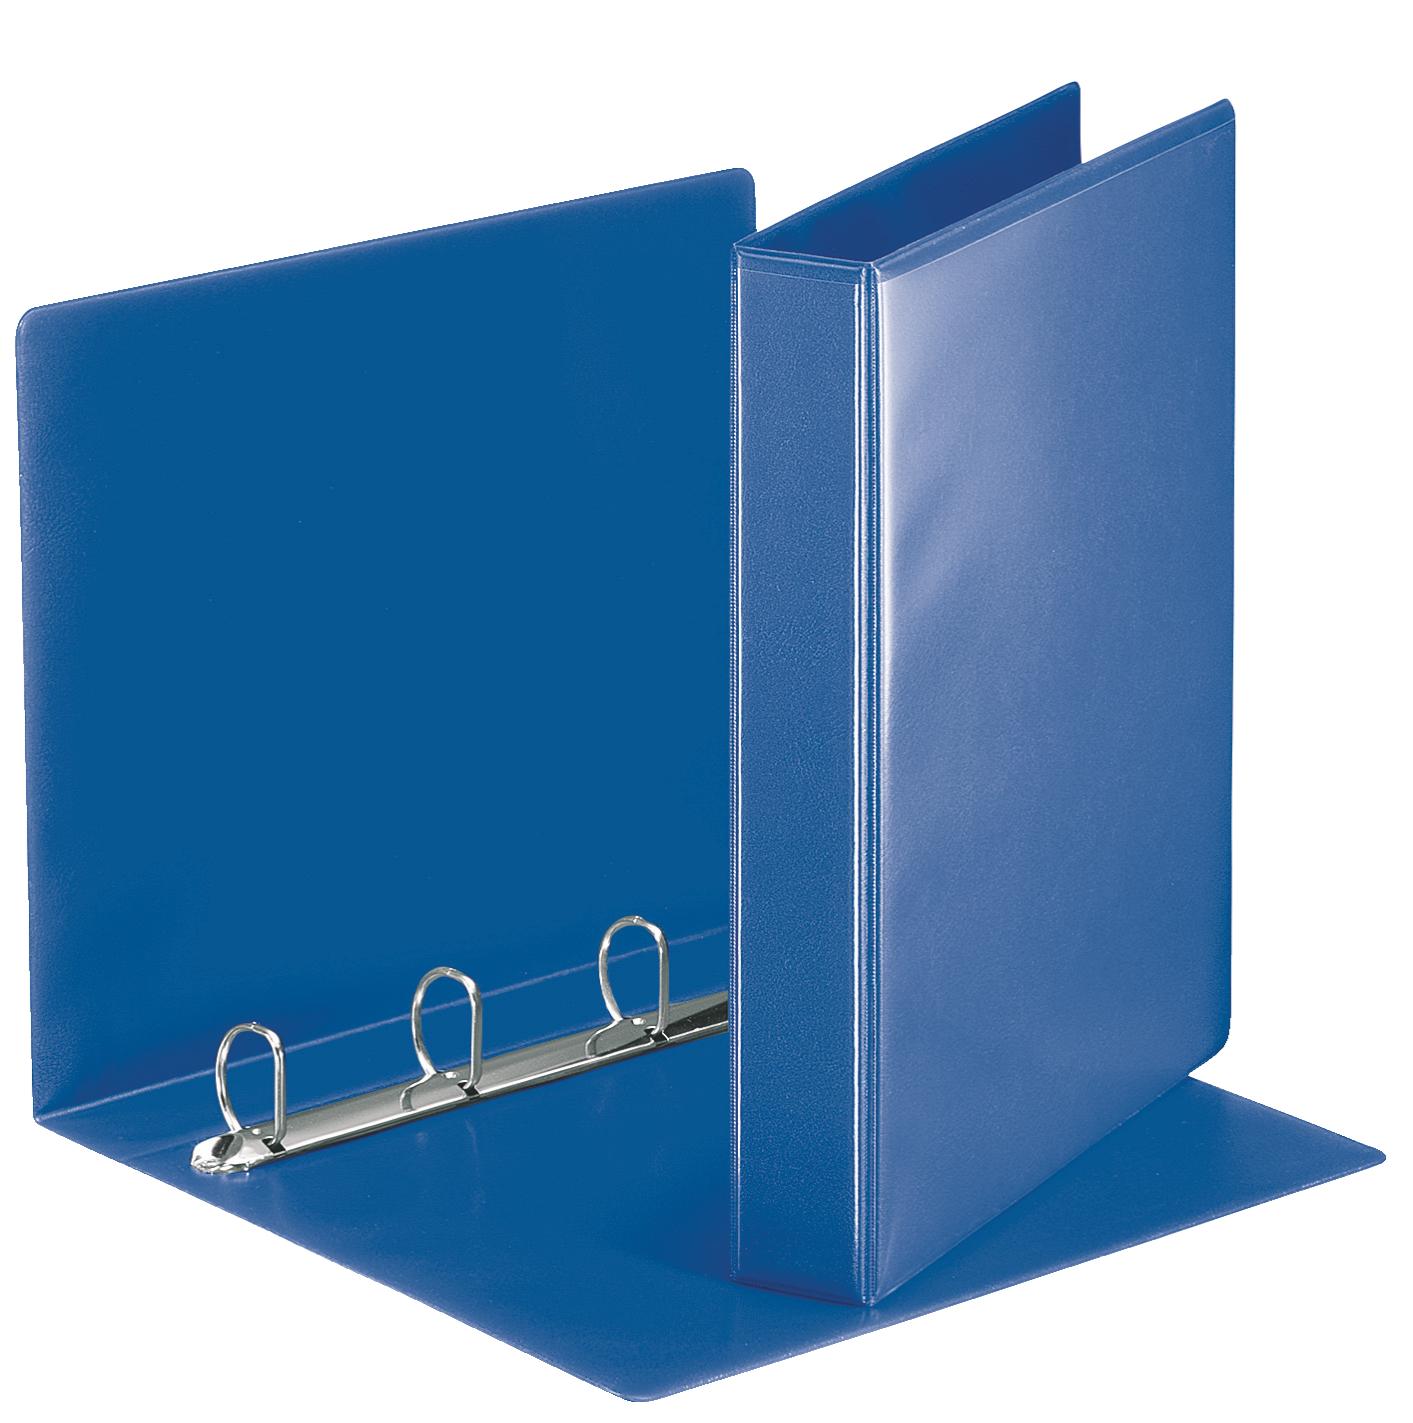 Esselte Essentials Pres Binder A4 30mm 4 D-Ring Blue PK10